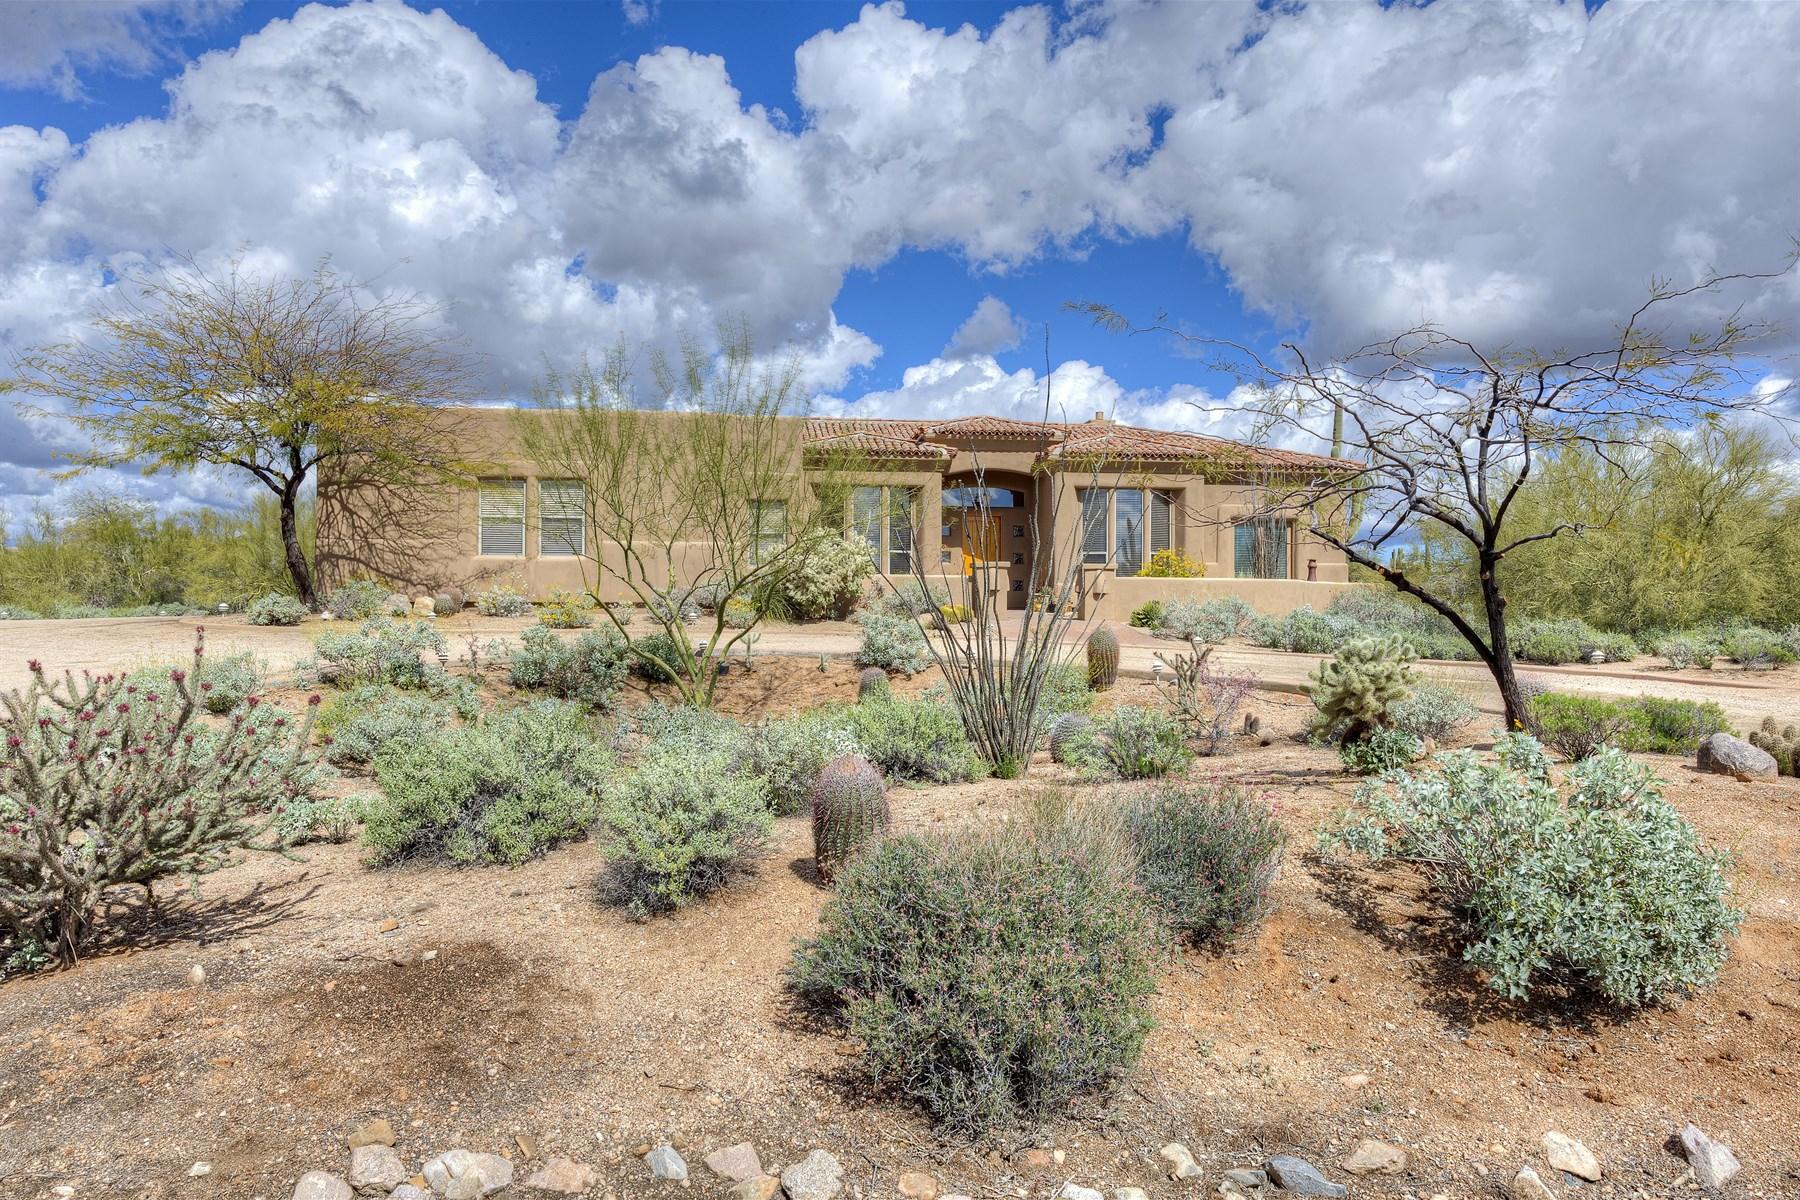 Casa Unifamiliar por un Venta en Wonderful North Scottsdale Home in Gated Community of Lone Mountain Vista 7498 E Milton Drive Scottsdale, Arizona 85266 Estados Unidos